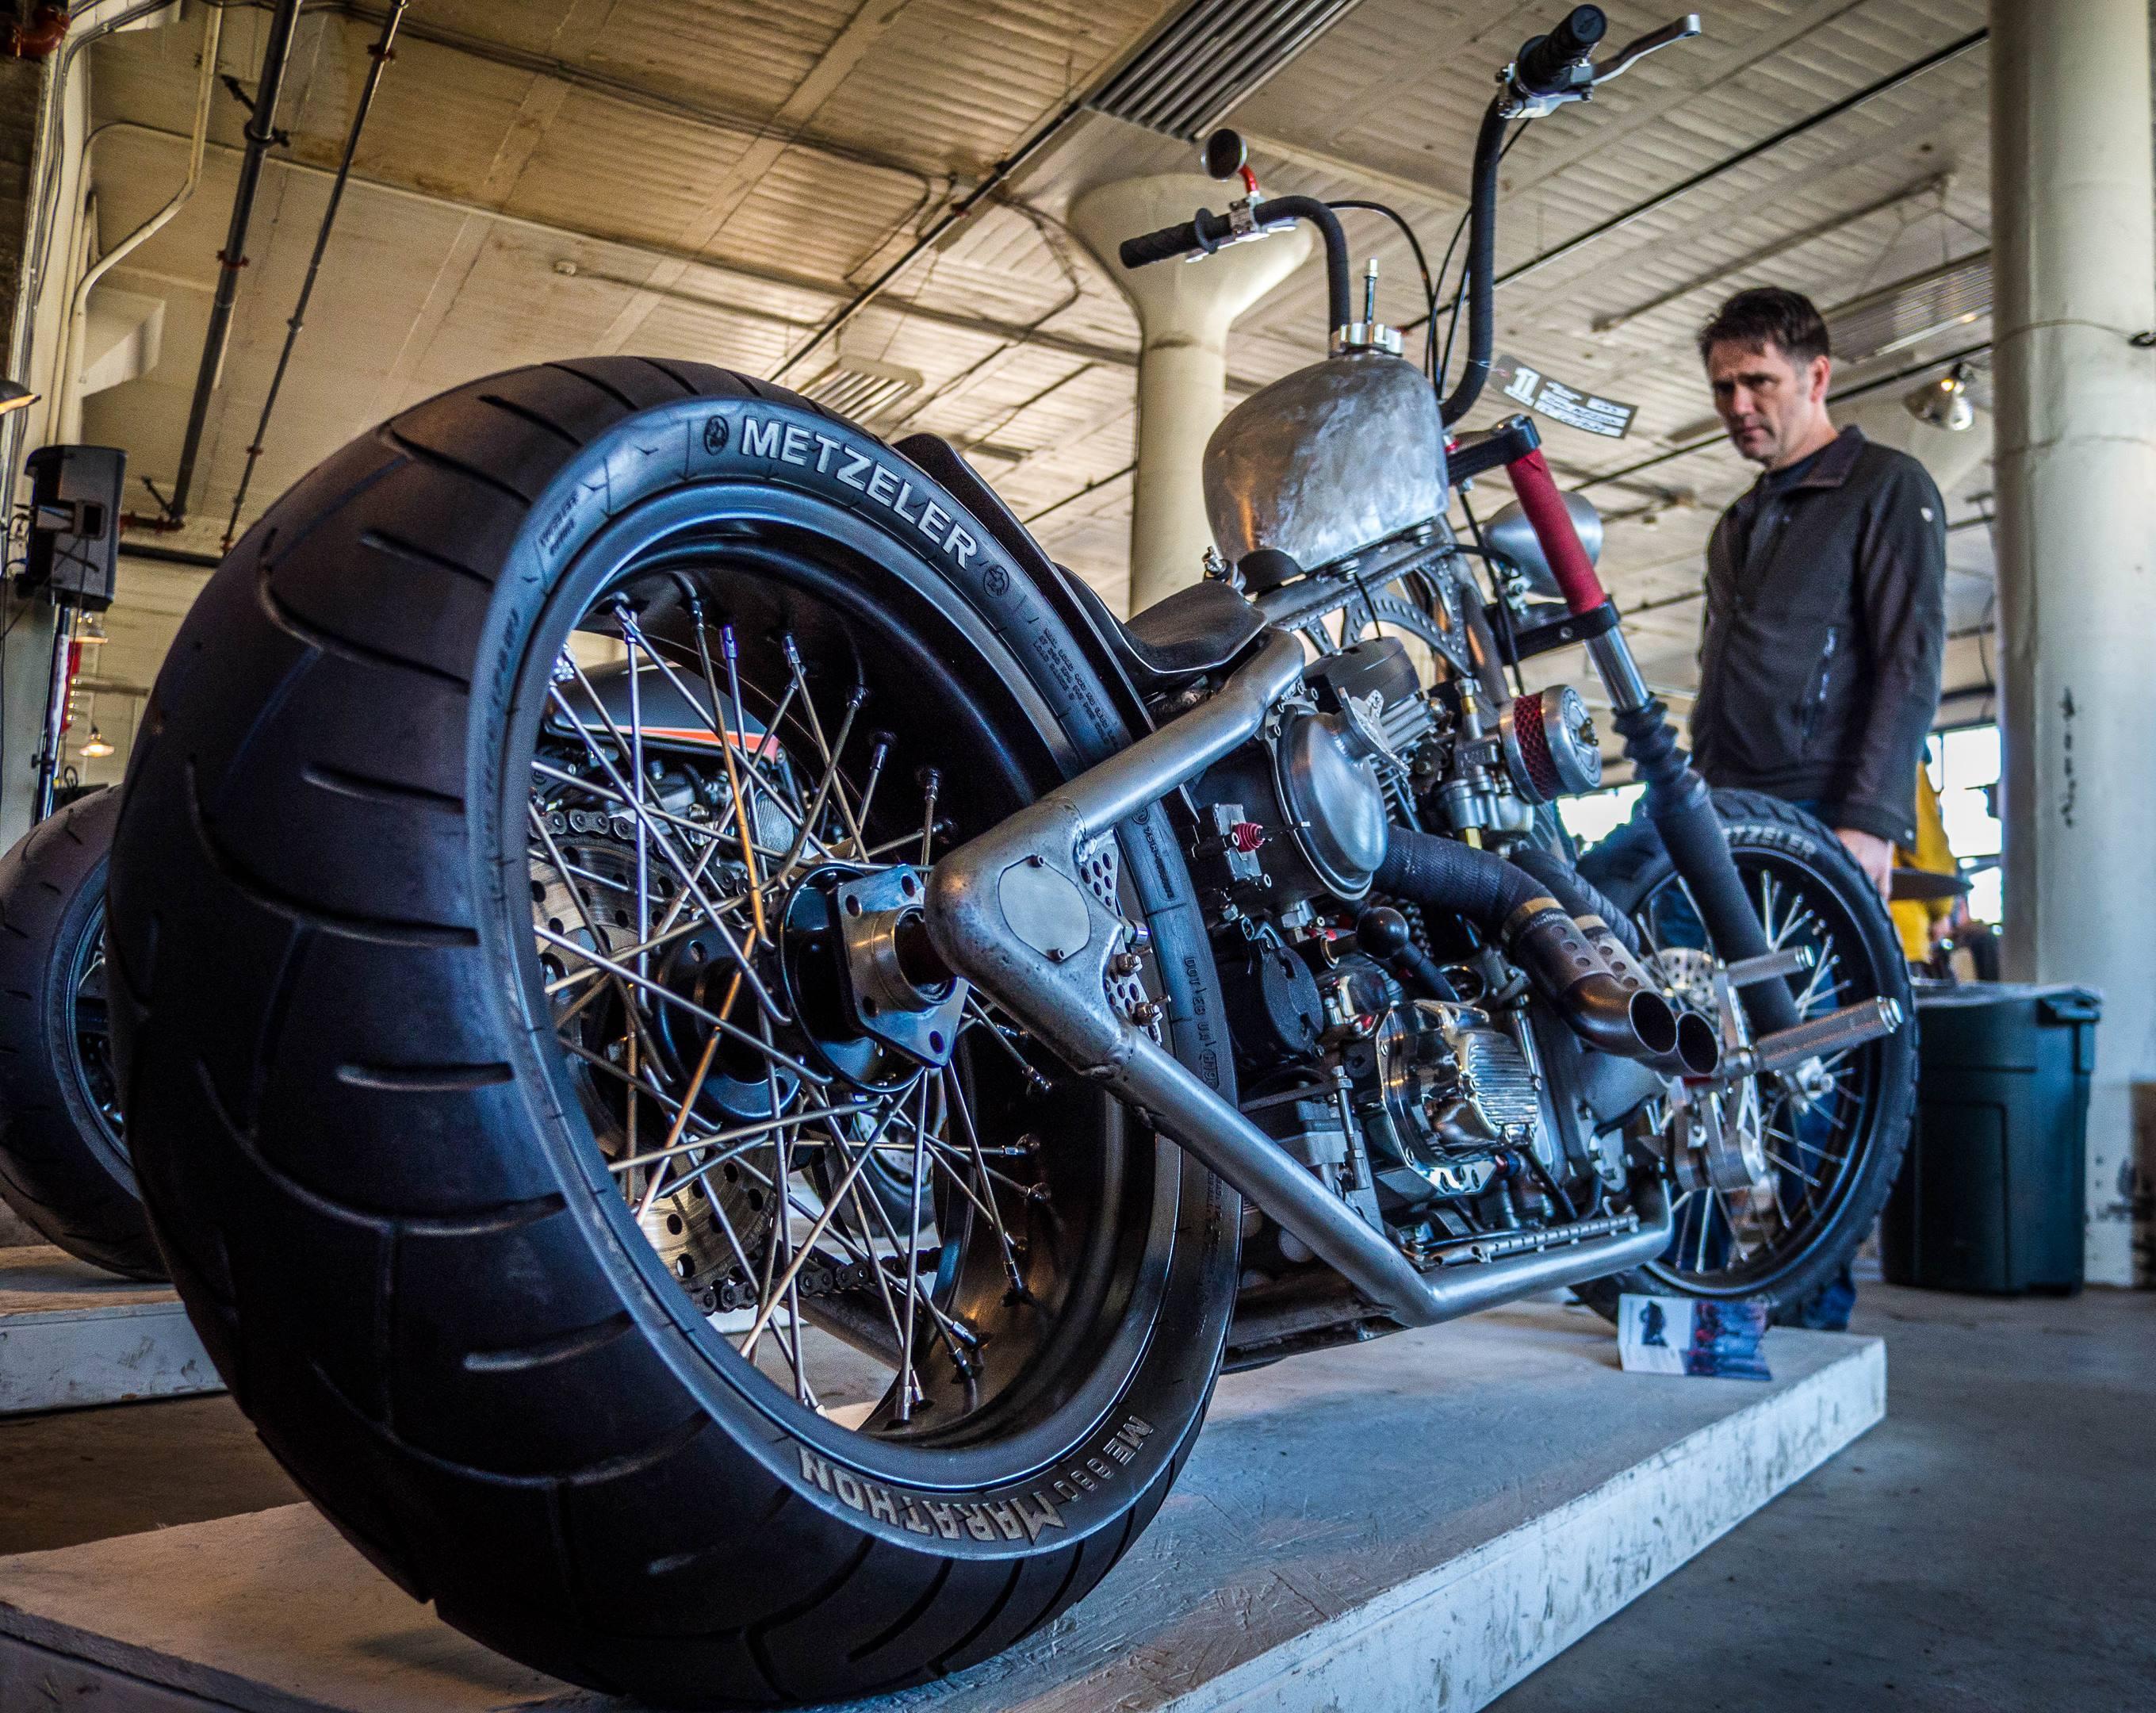 A full custom with a fatty boombalatty rear tire, built by John Aleckson.